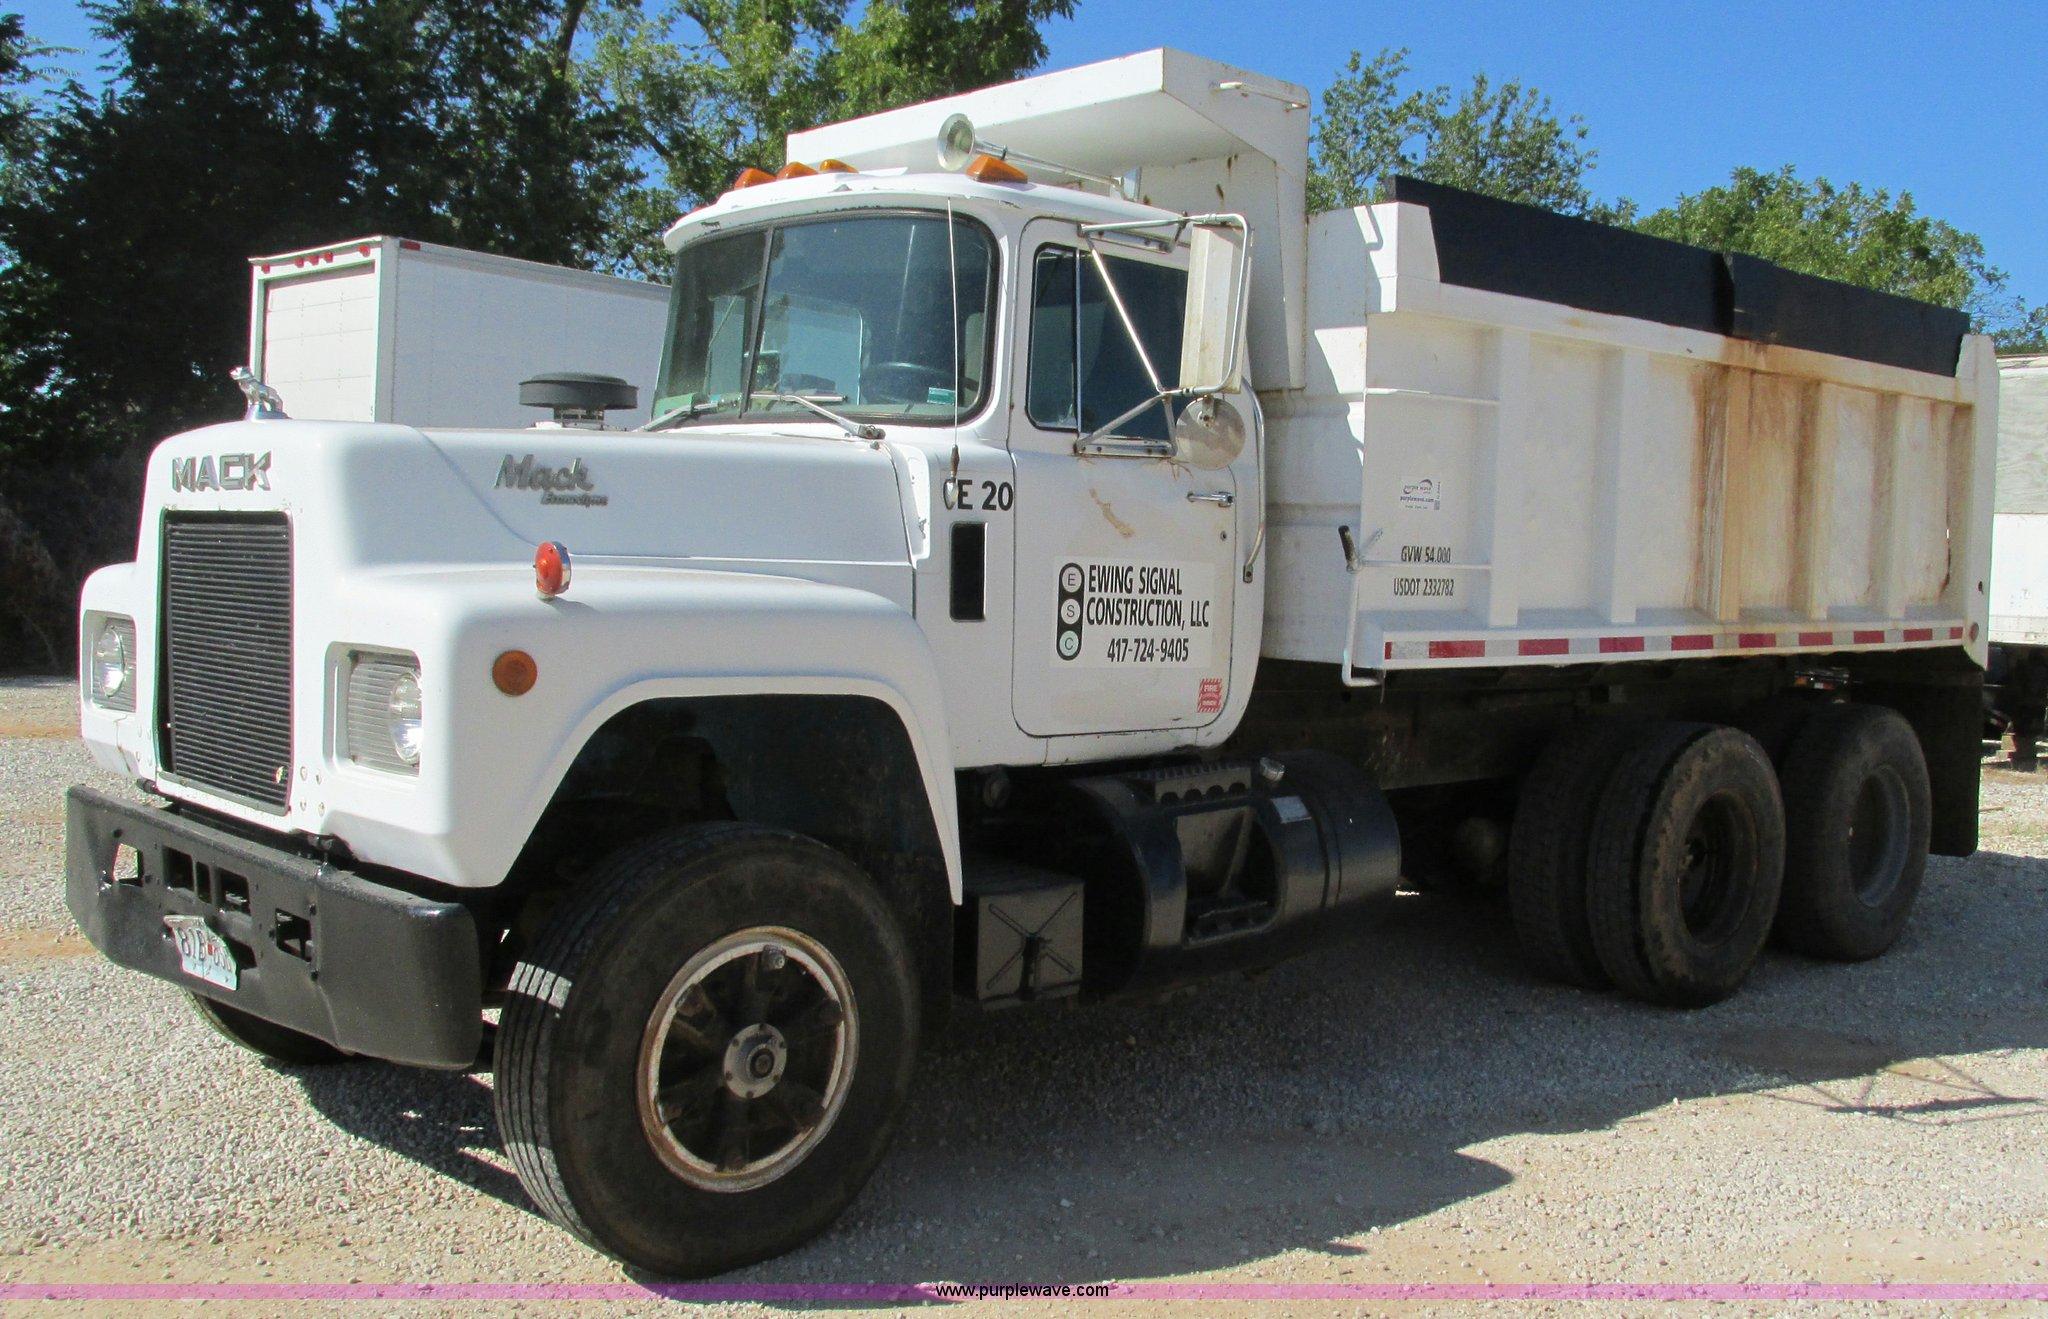 Mack Dump Truck Trailer Wiring Library G9444 Image For Item 1989 Econodyne R690st